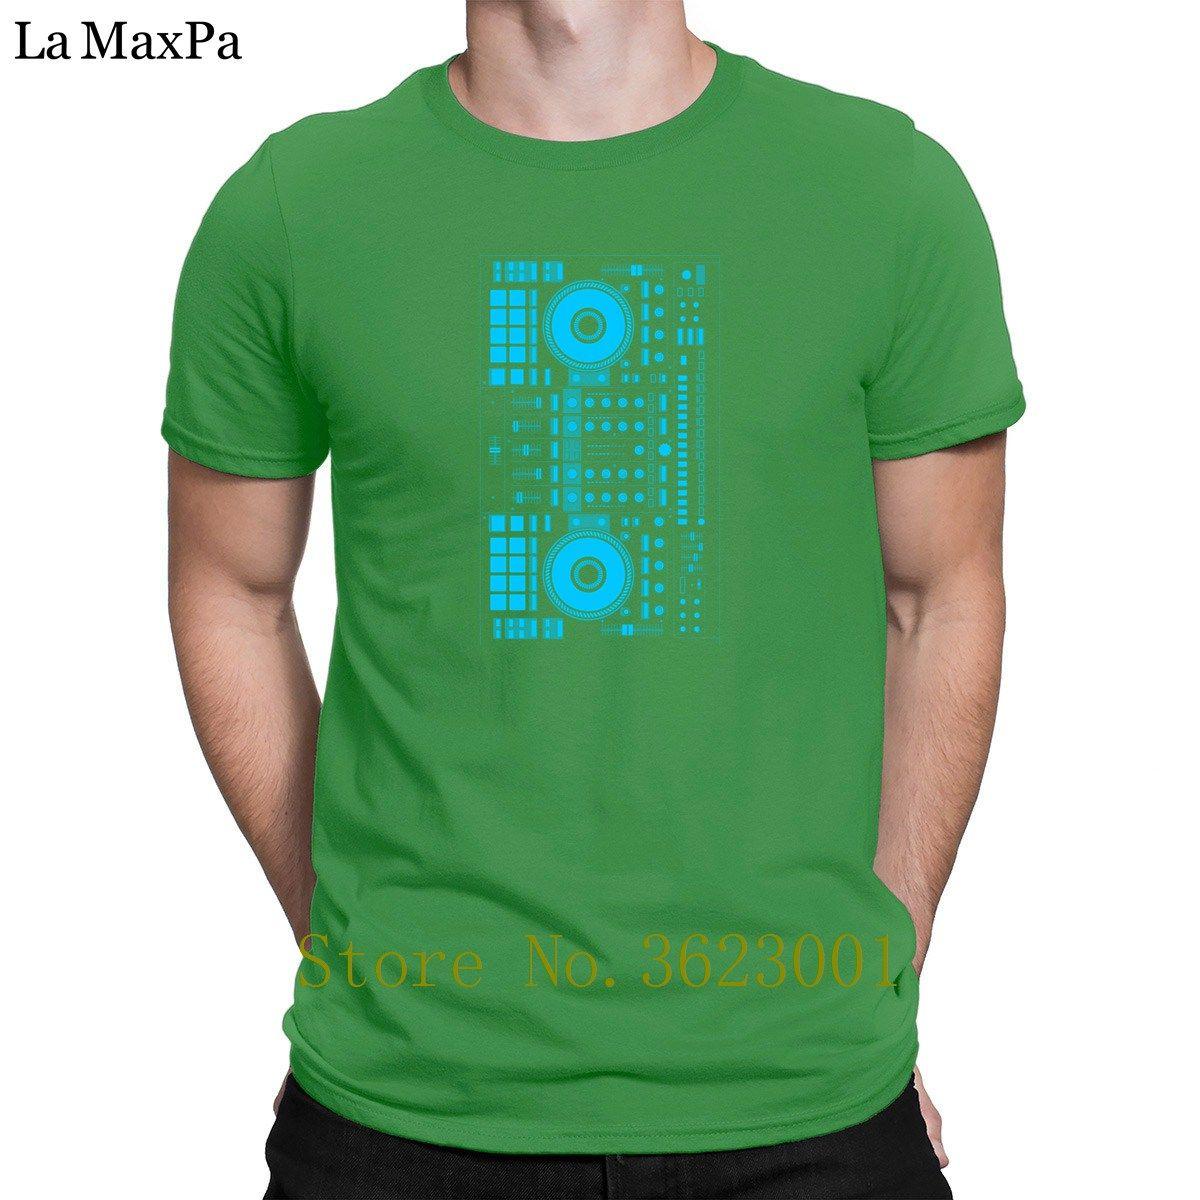 Cheap criatura Venda camiseta azul Dj Tee Shirt-3xl S T-shirt Streetwear Tamanho Man Euro Formal camiseta Elegante respirável